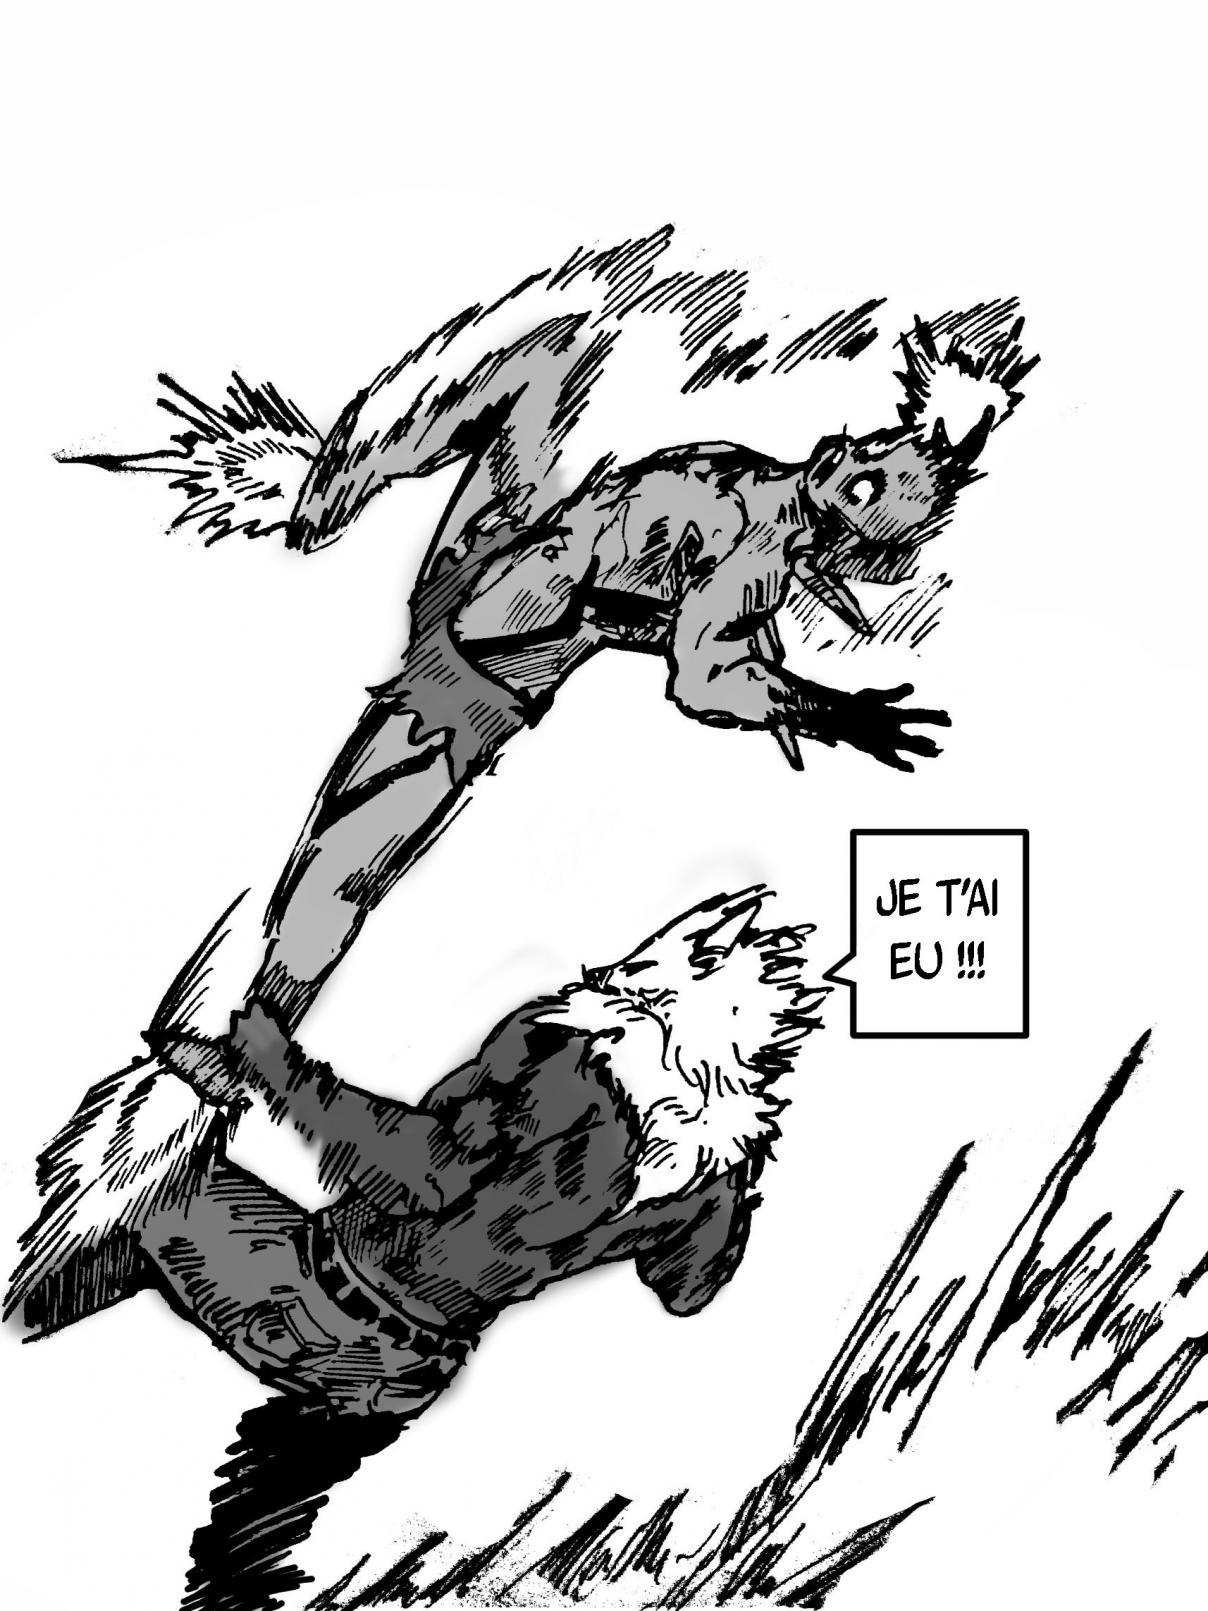 https://nine.mangadogs.com/fr_manga/pic2/57/11385/558869/1d11fefd8716b42d3decf26d287610fe.jpg Page 4